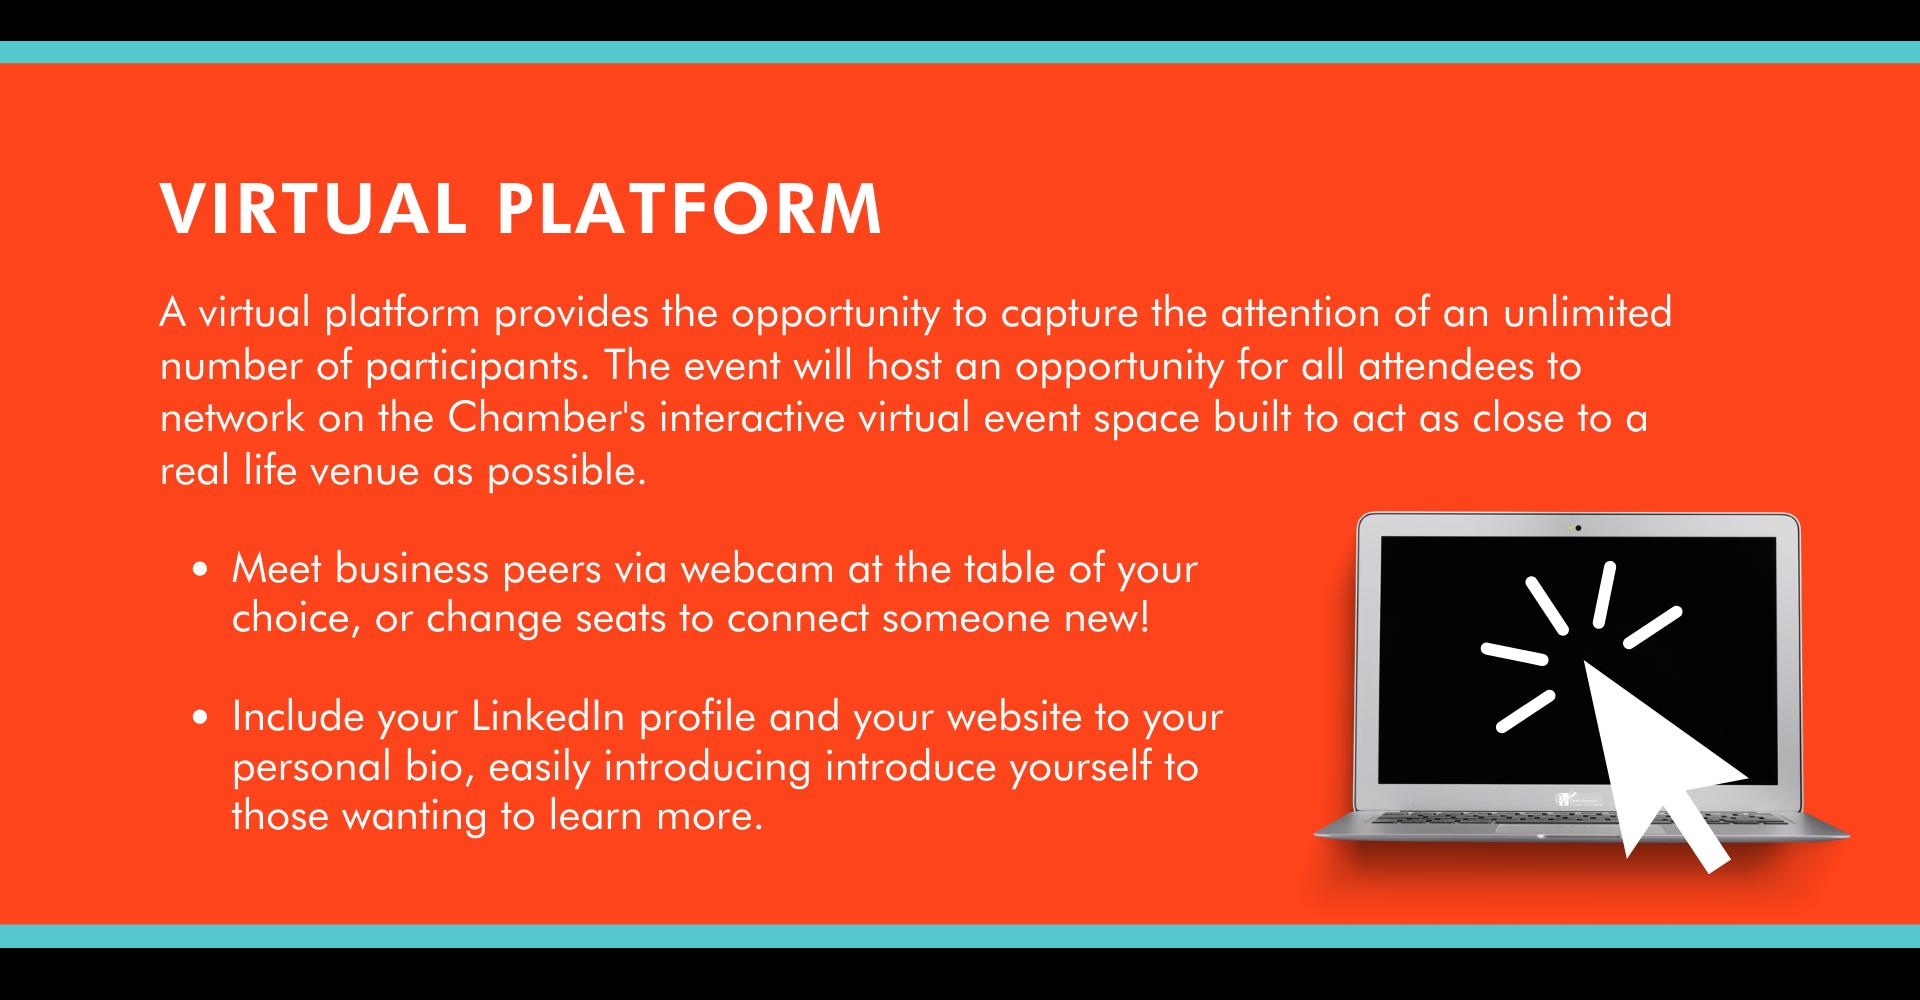 virtual platform mind what matters